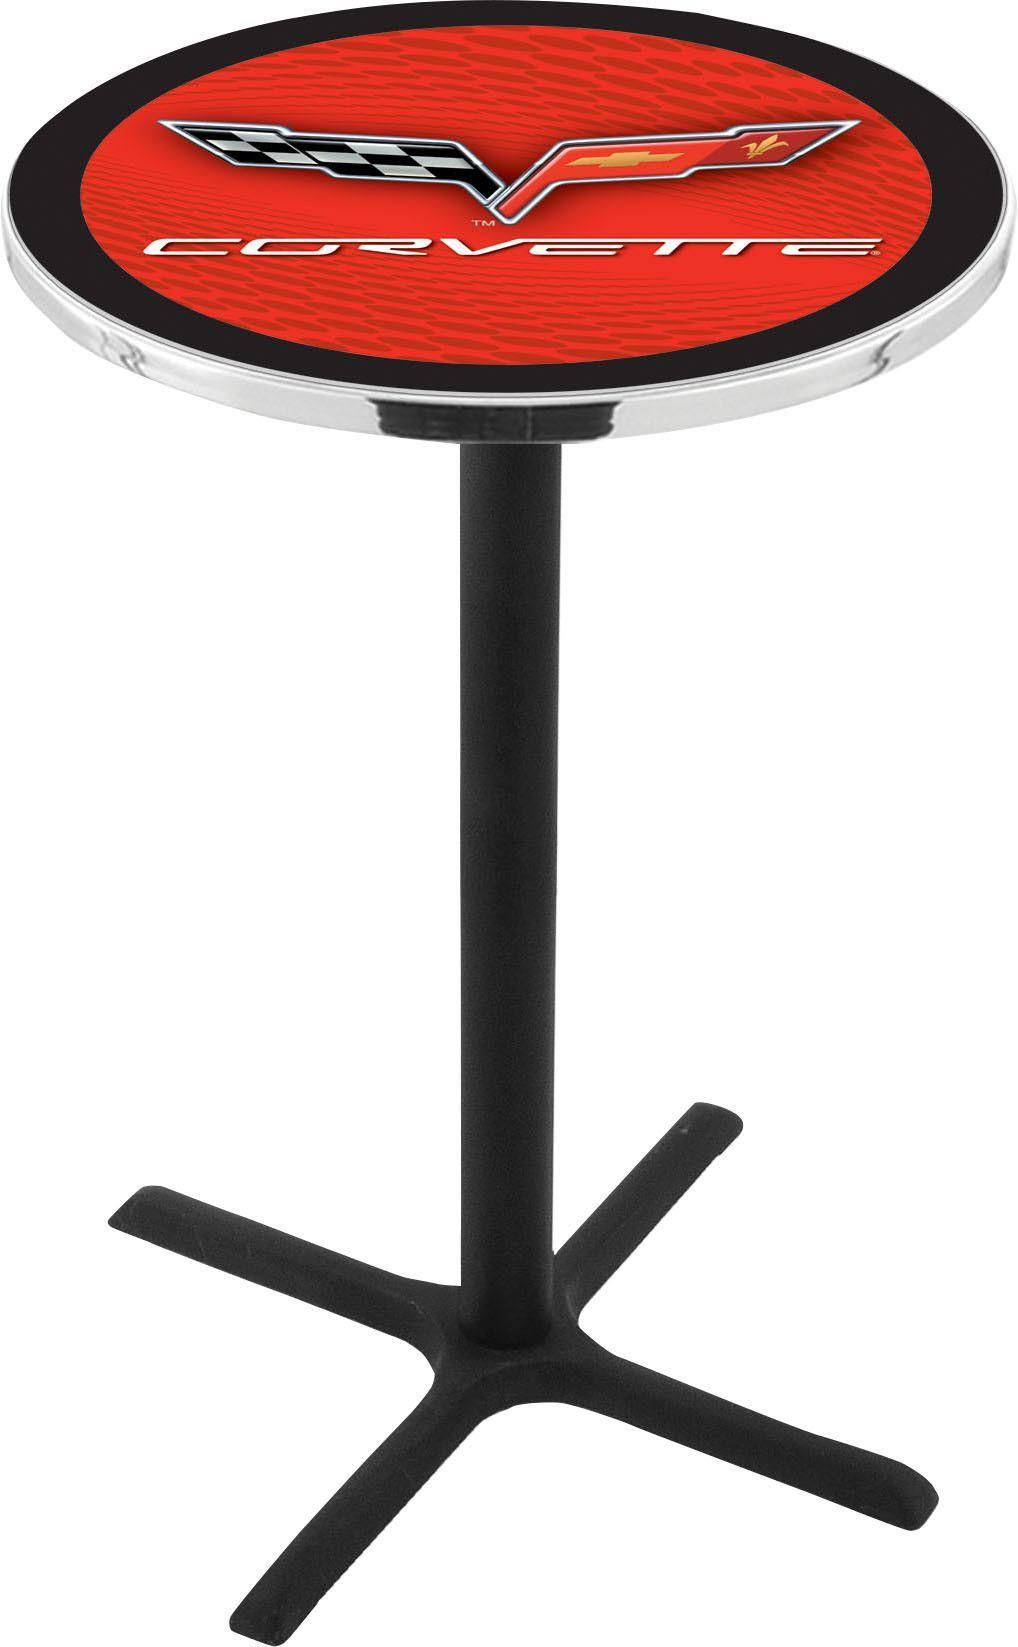 Adams Dining Table Holland bar stool, Bar stools, Cross feet